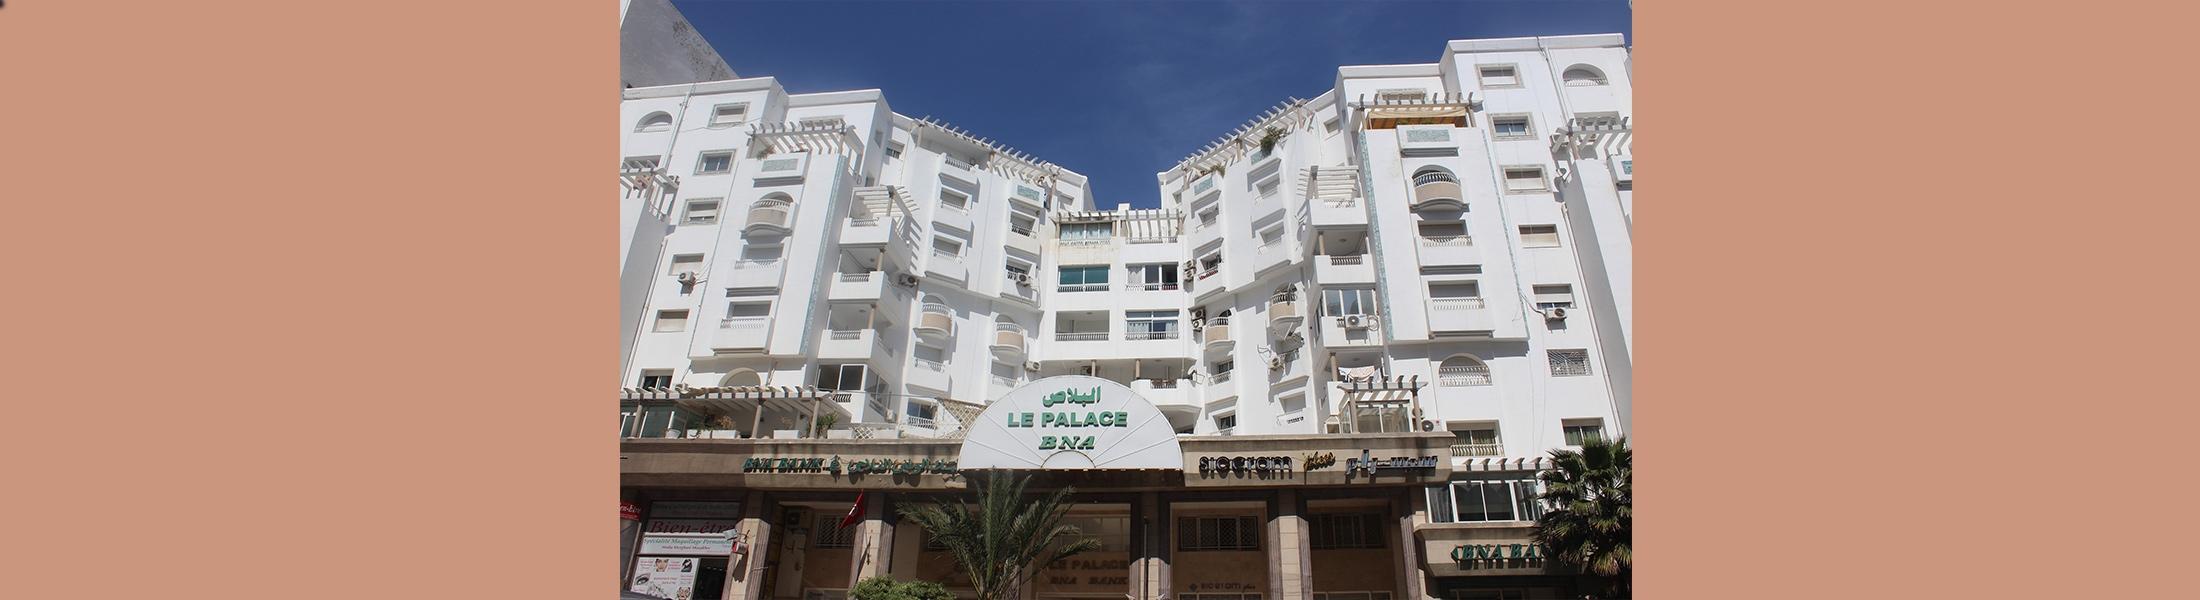 Appartement Olfa II (AO 03/2021)